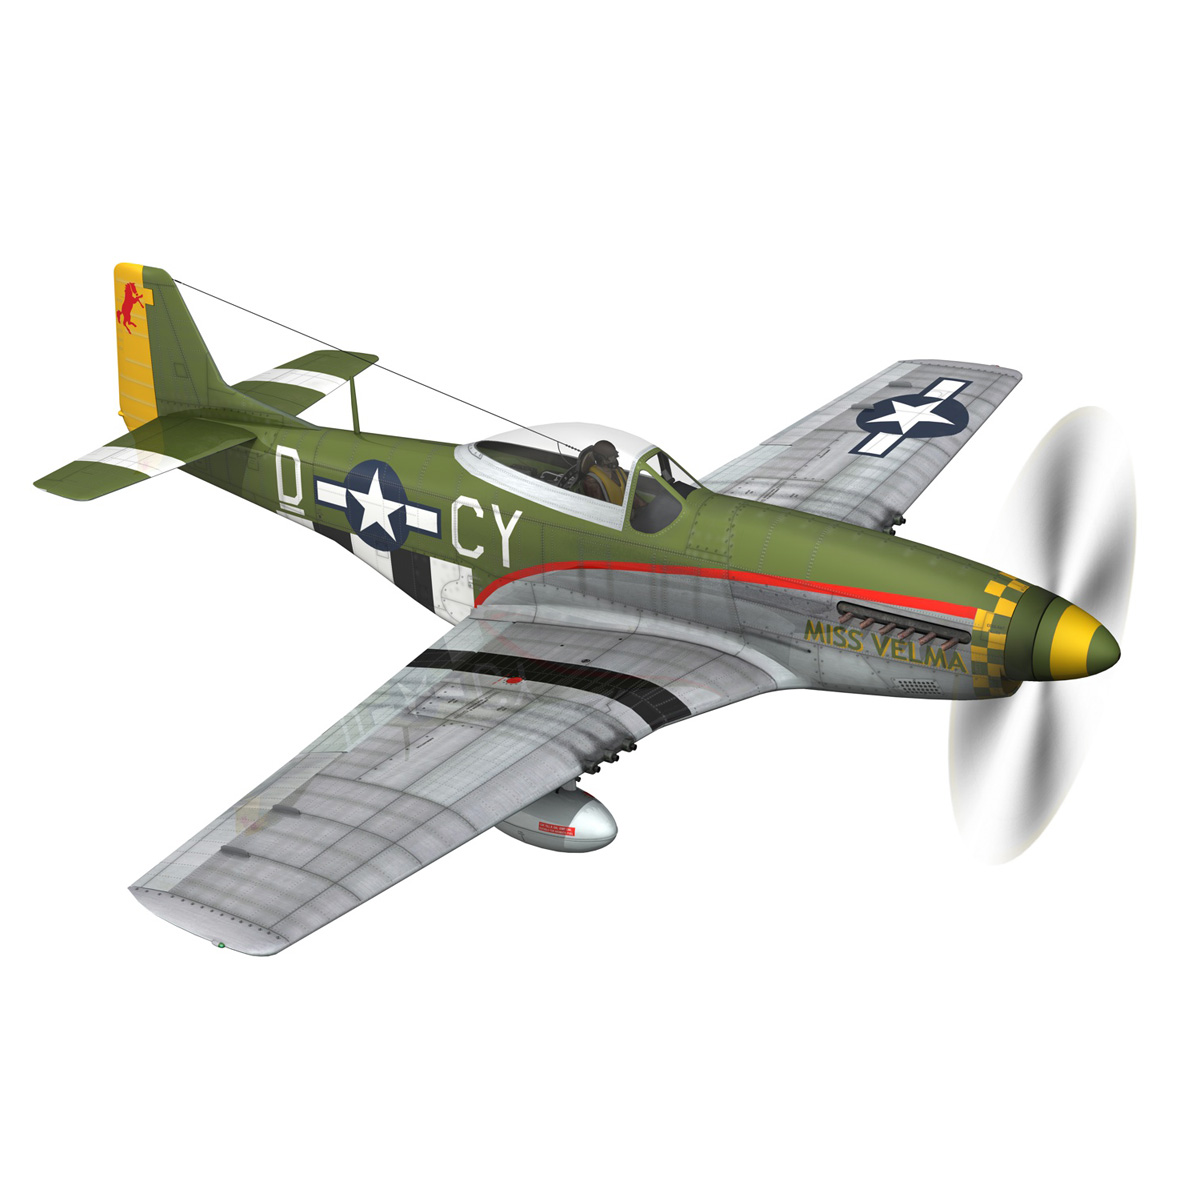 north american p-51d – mustang – miss velma 3d model 3ds fbx c4d lwo obj 267623